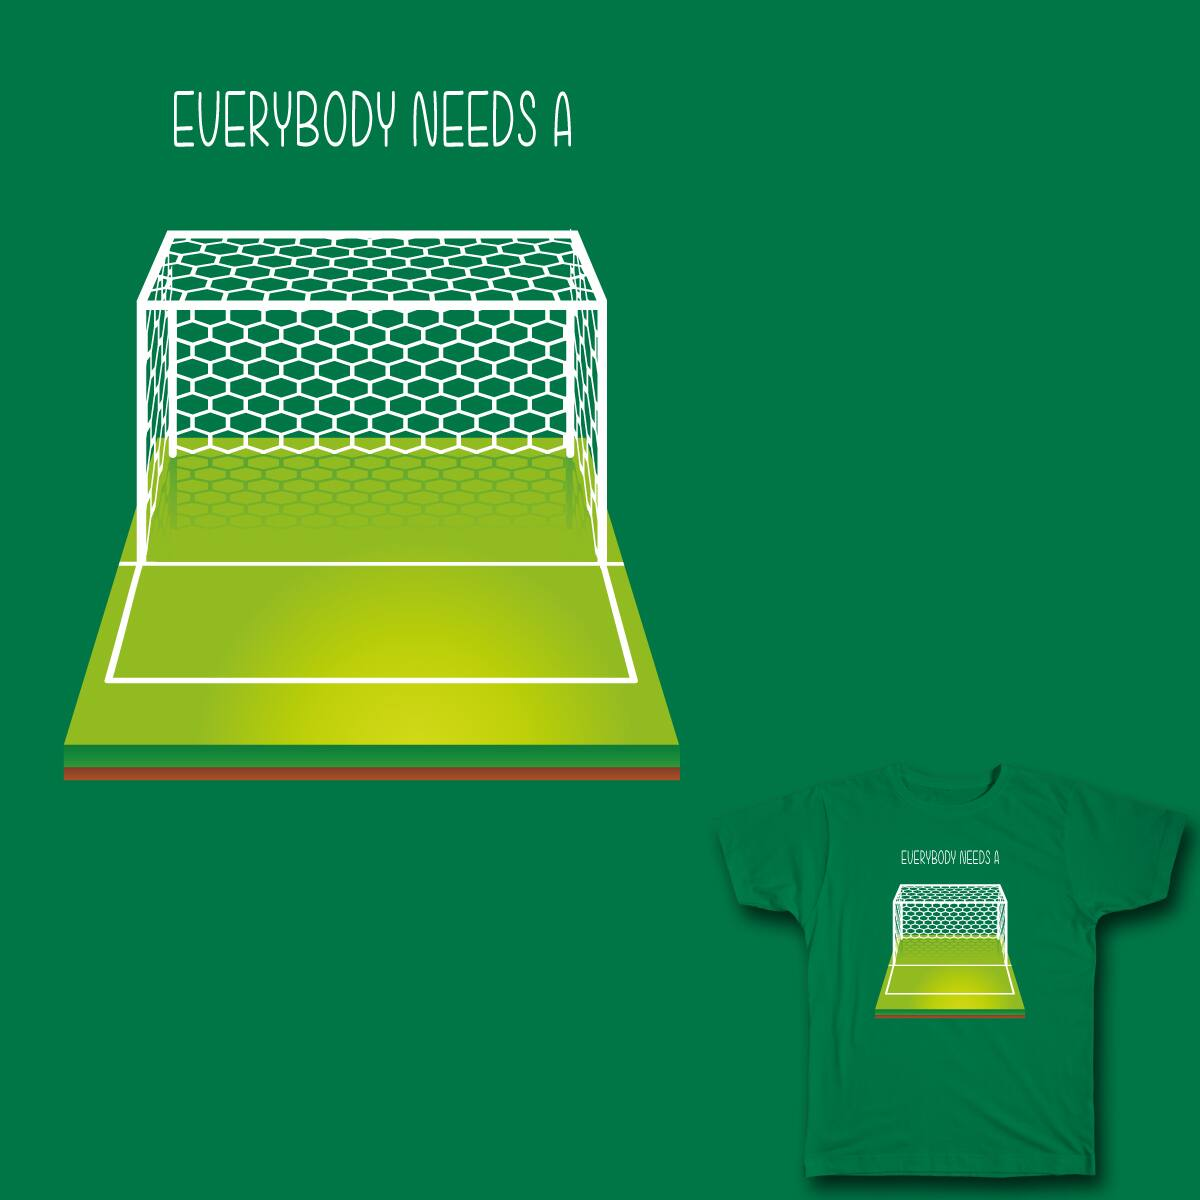 Everybody needs a goal by shaneseeam on Threadless